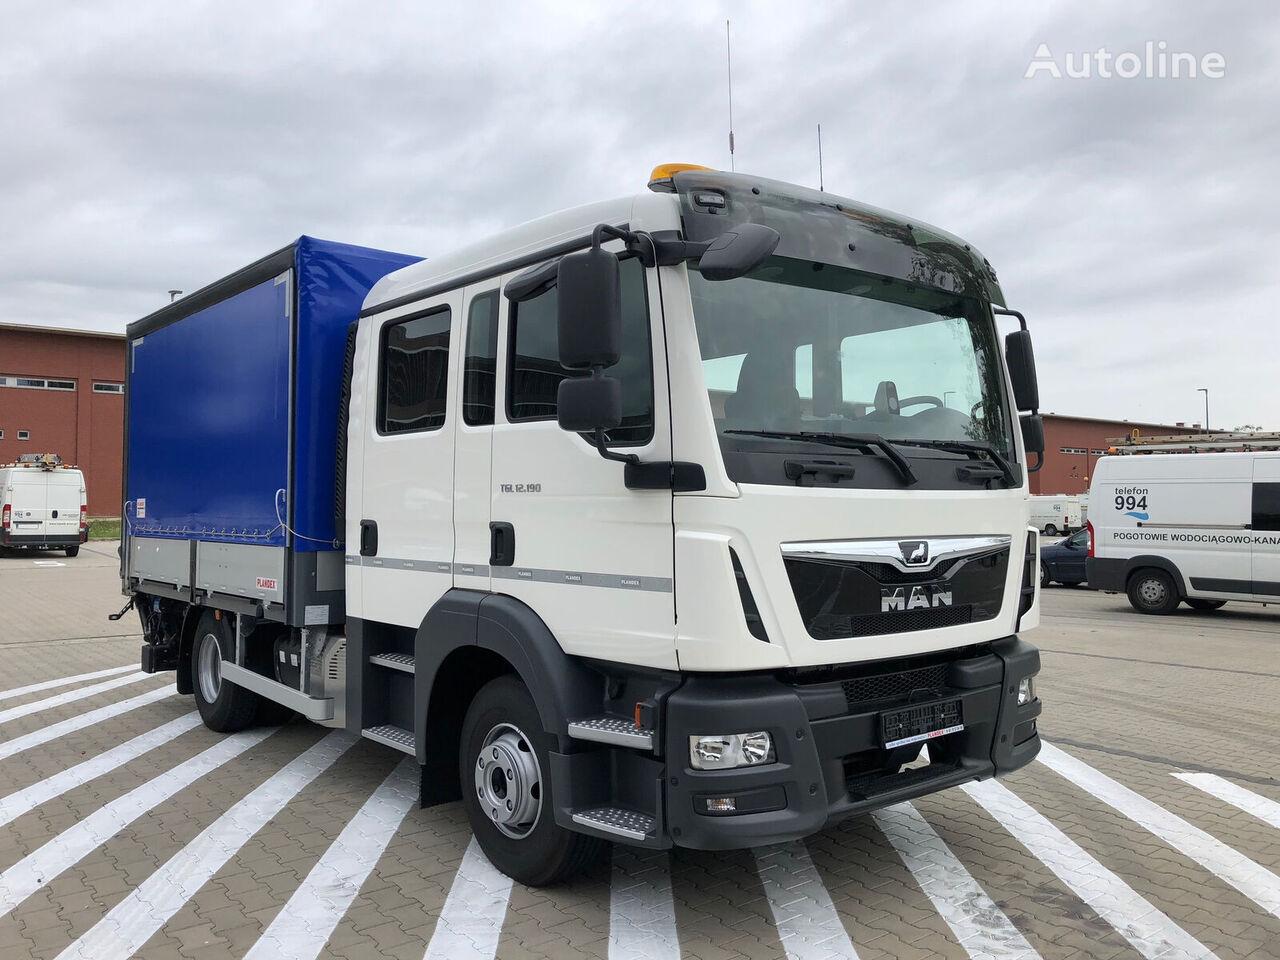 MAN TGL 12.190 , E6 , 0 km , 2020 , NEW , DOKKA cab , 3 UNITS  curtainsider truck